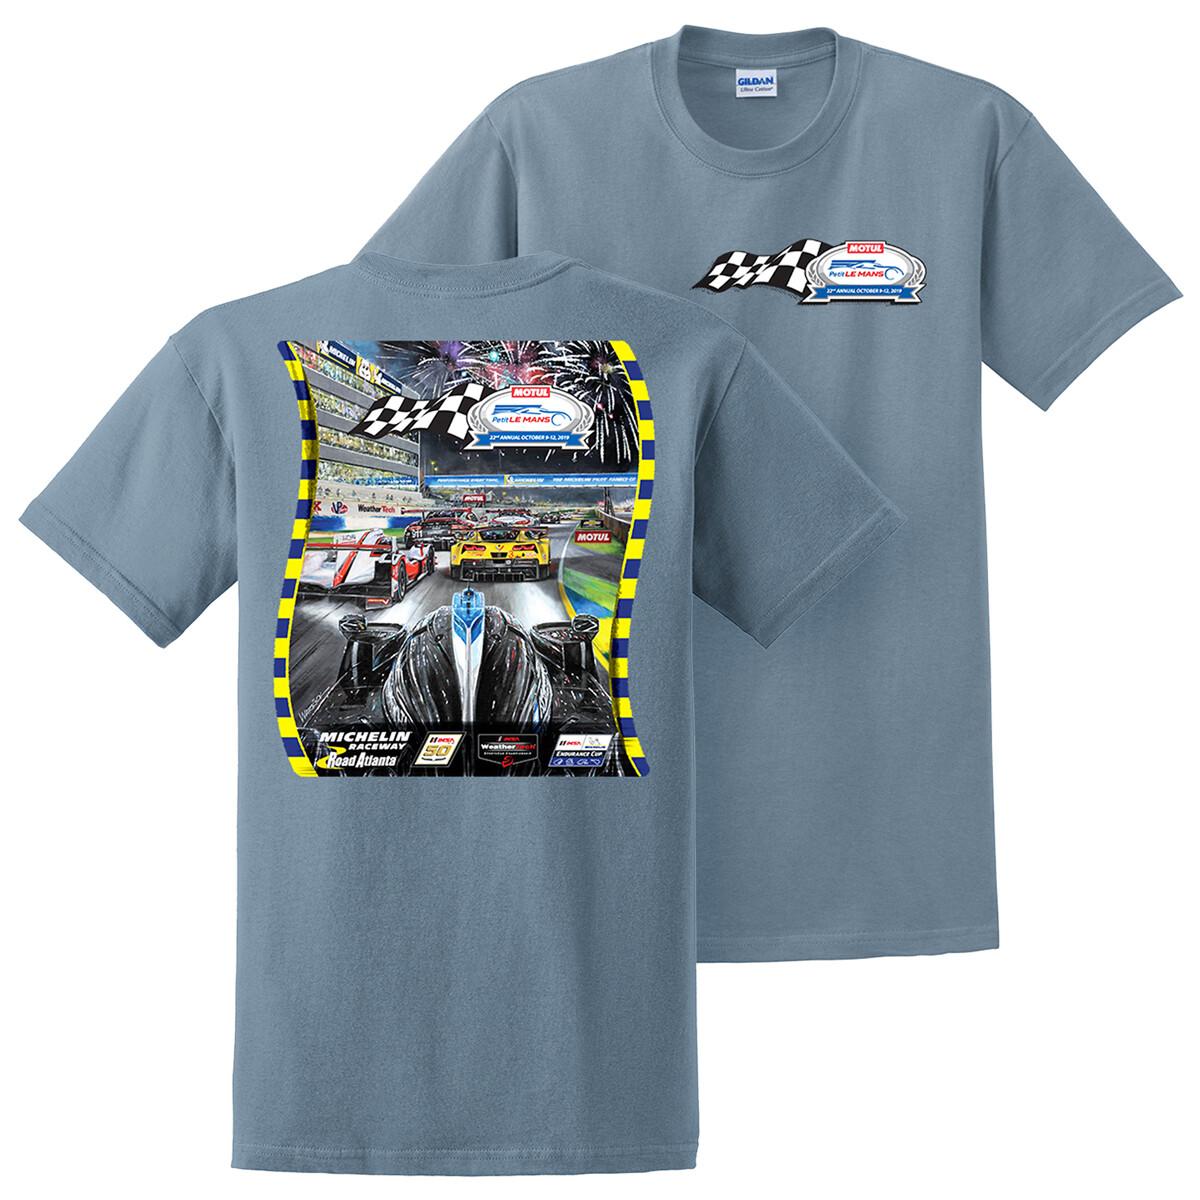 2019 Motul Petit Le Mans Poster Tee - Stone Blue